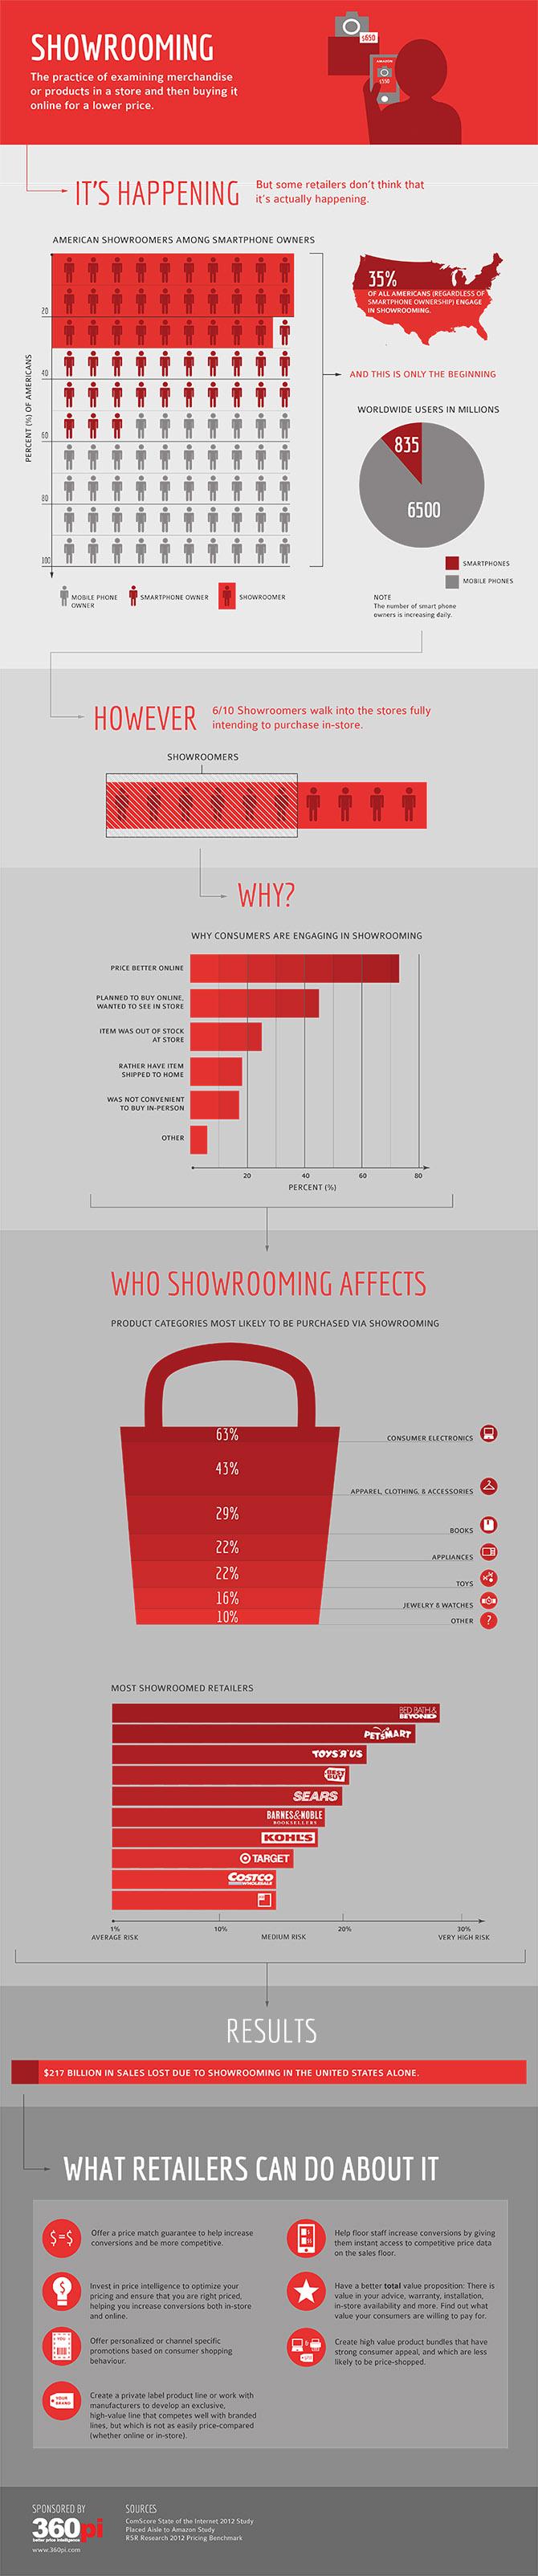 Showrooming8